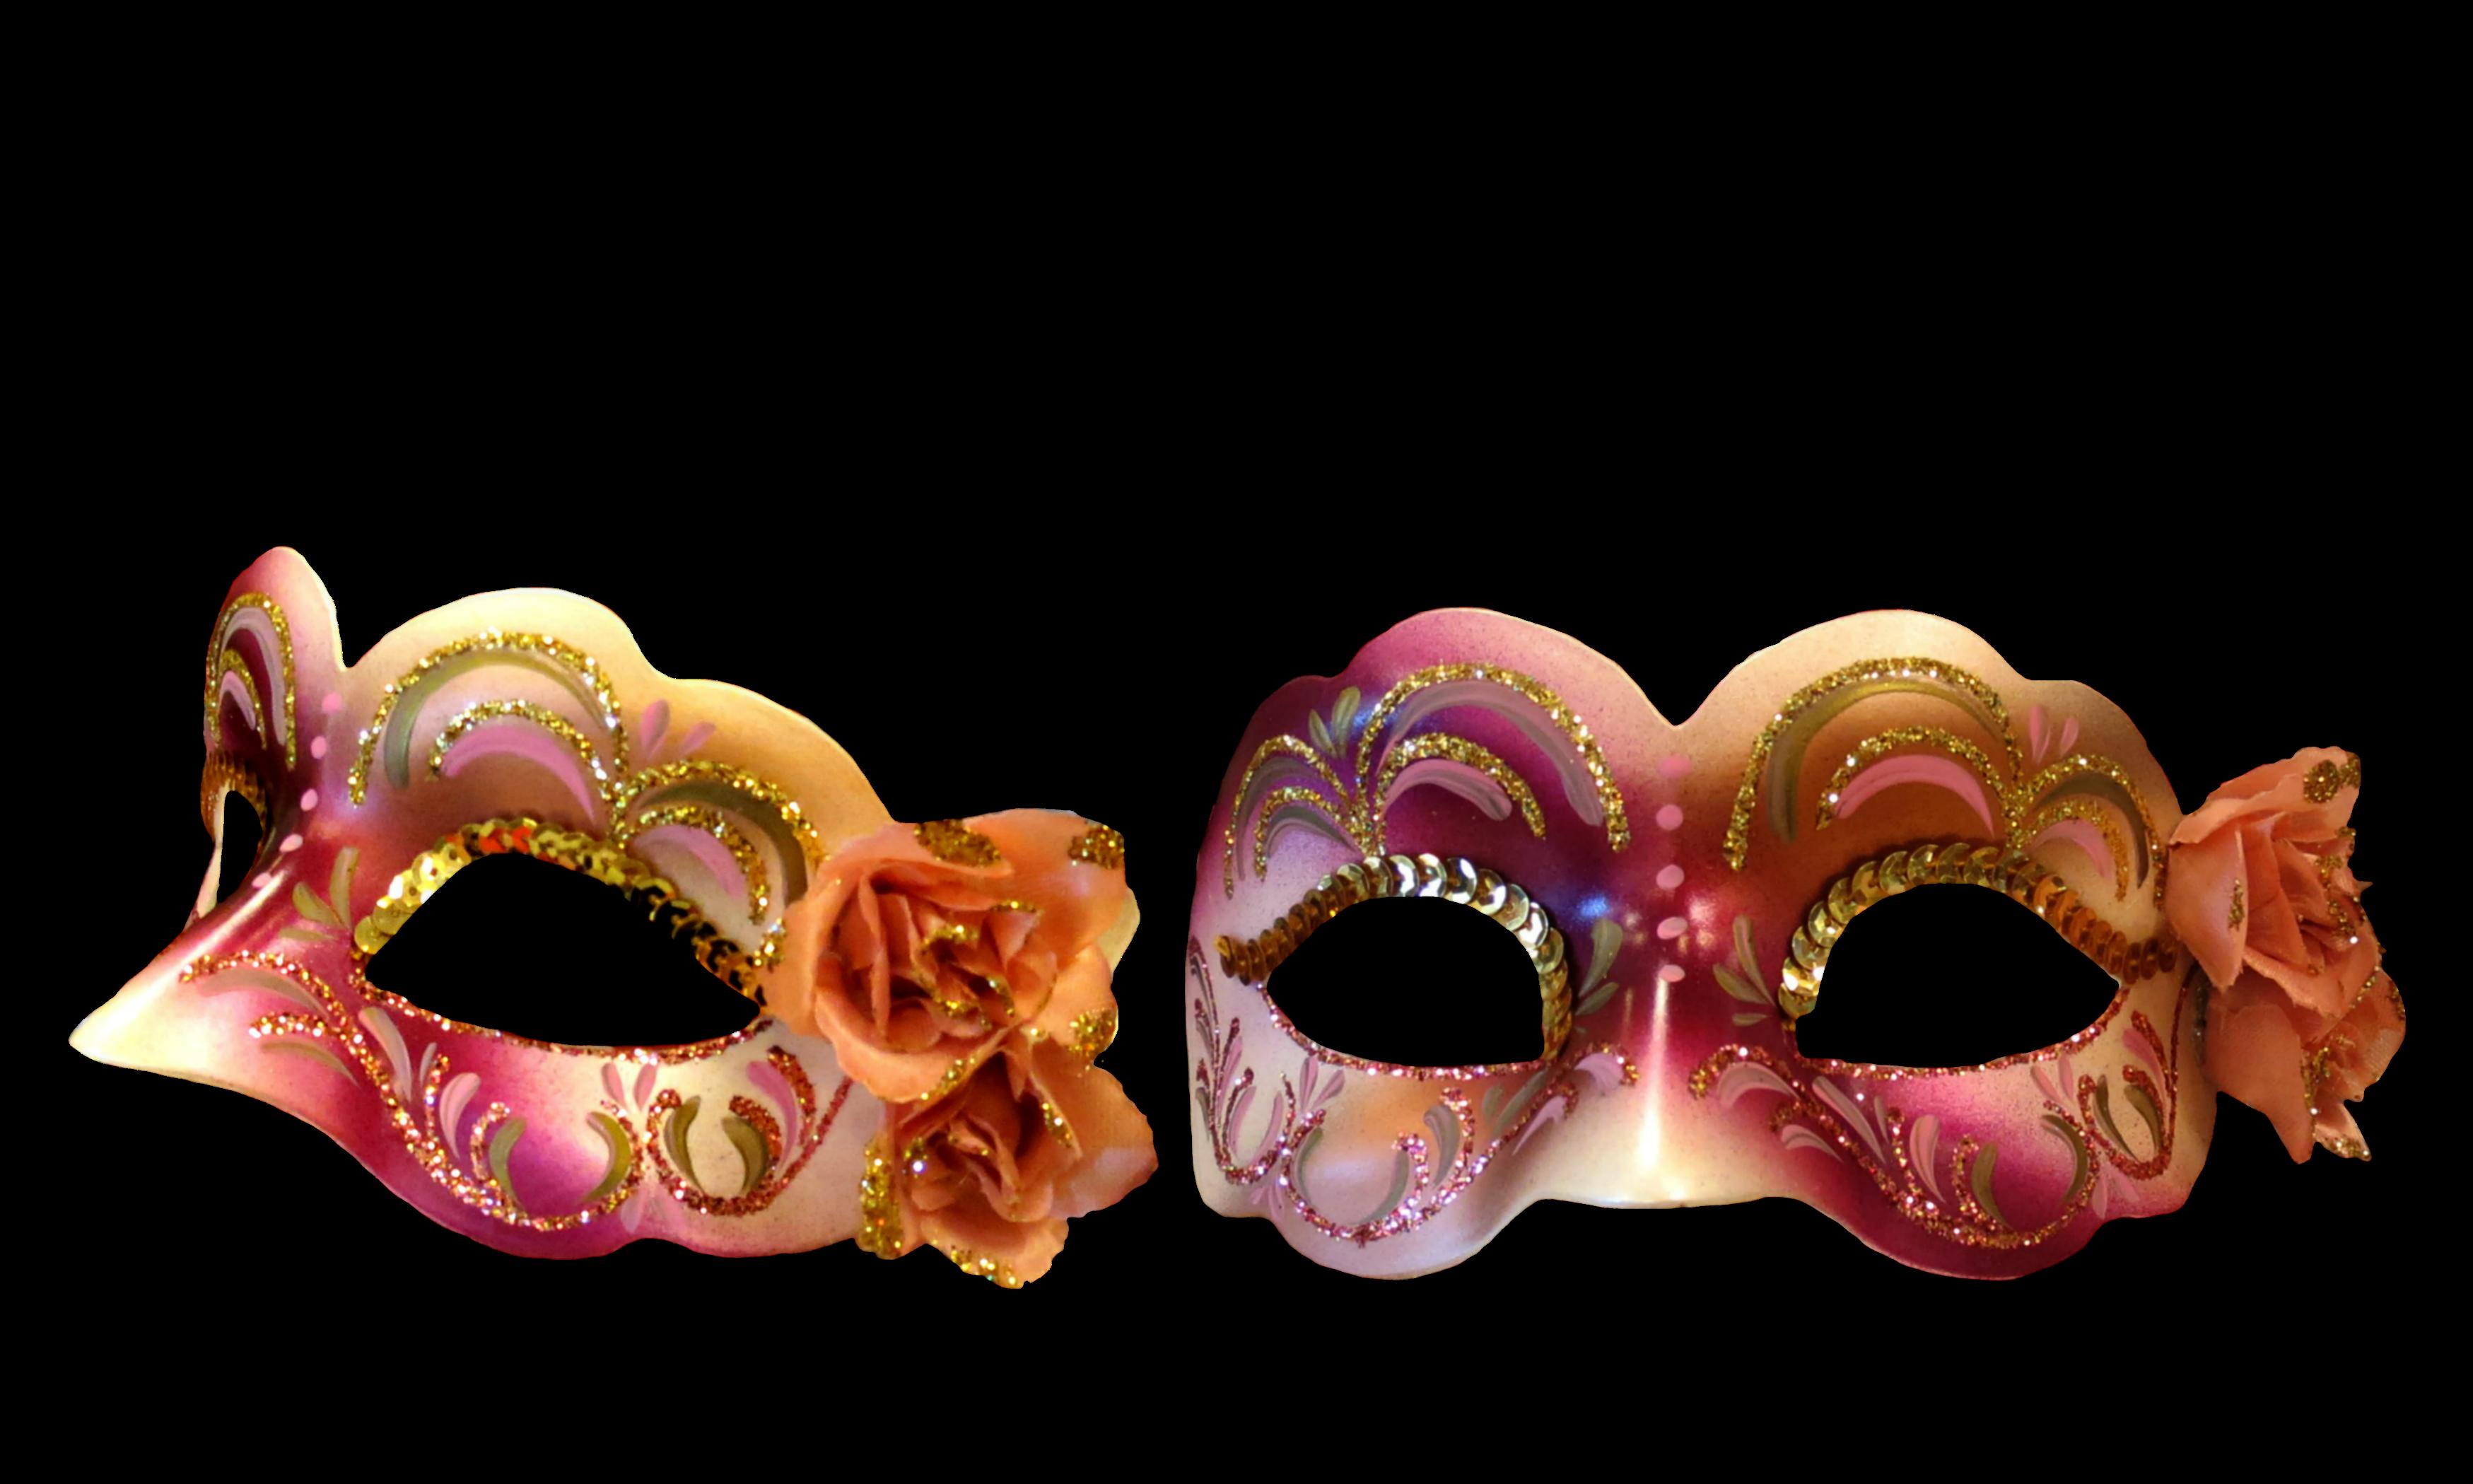 Mask Png Roses Vampstock By Vampstock On Deviantart